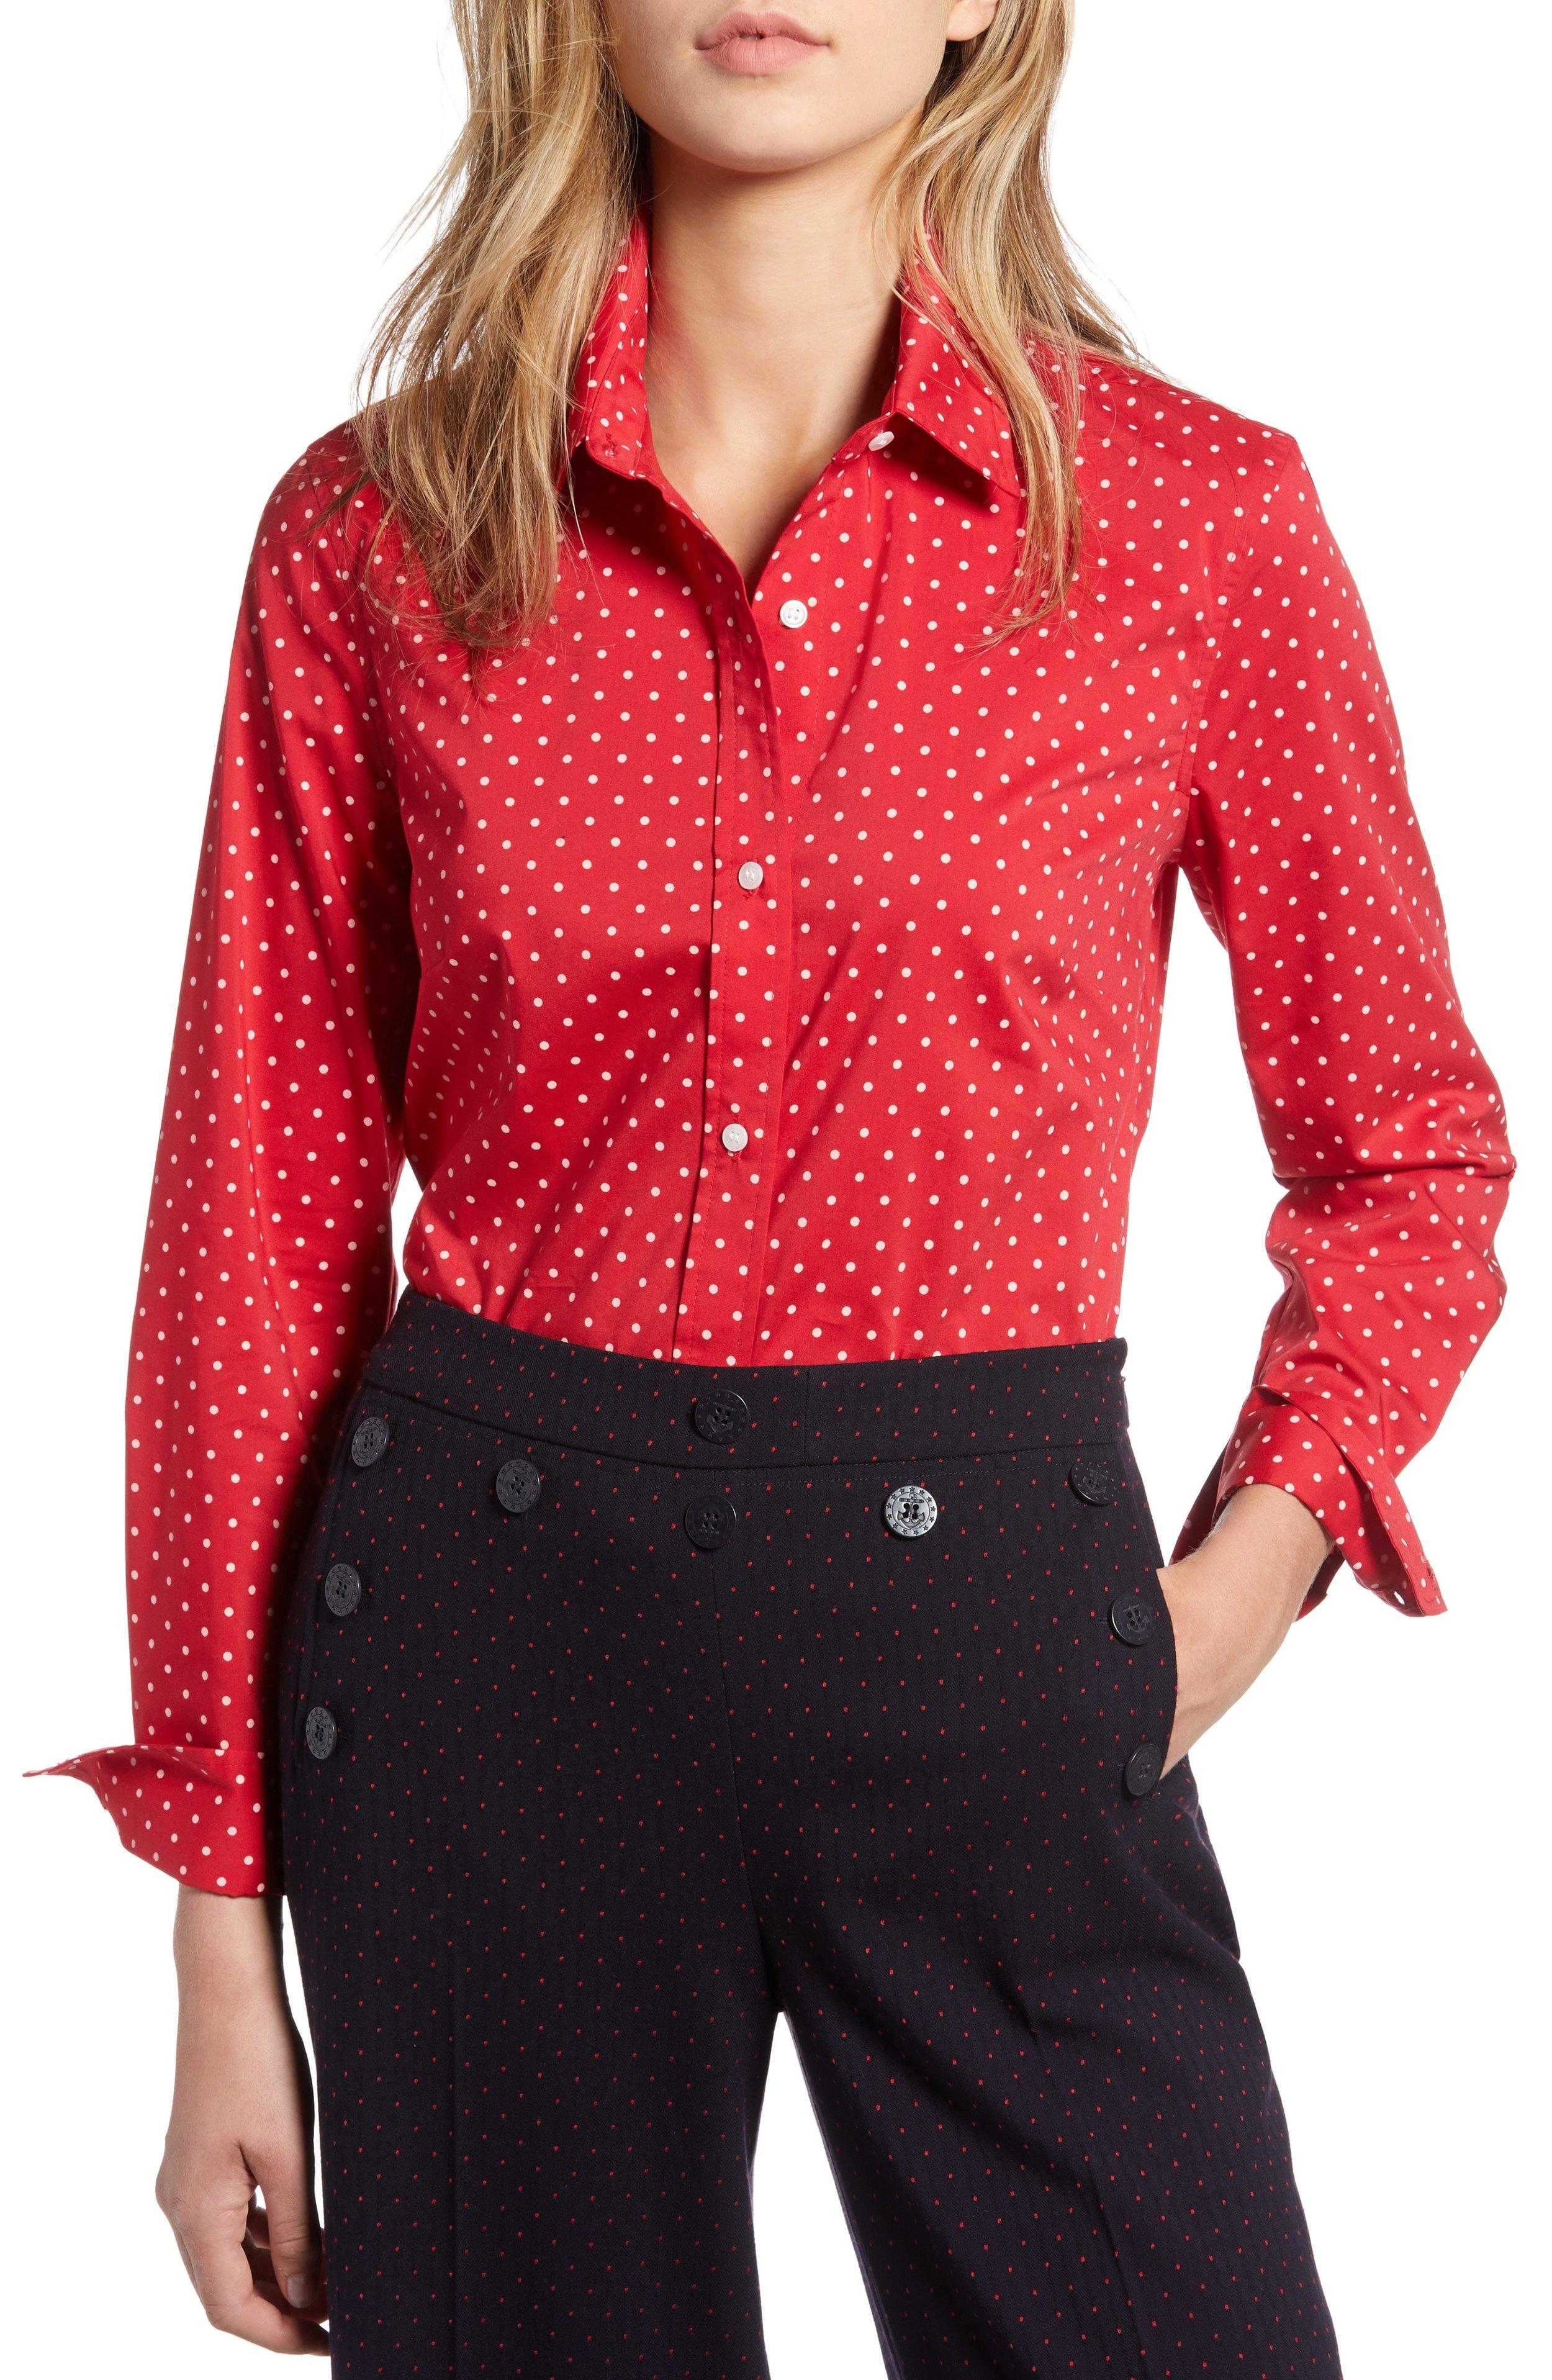 red polka dot shirt.jpg